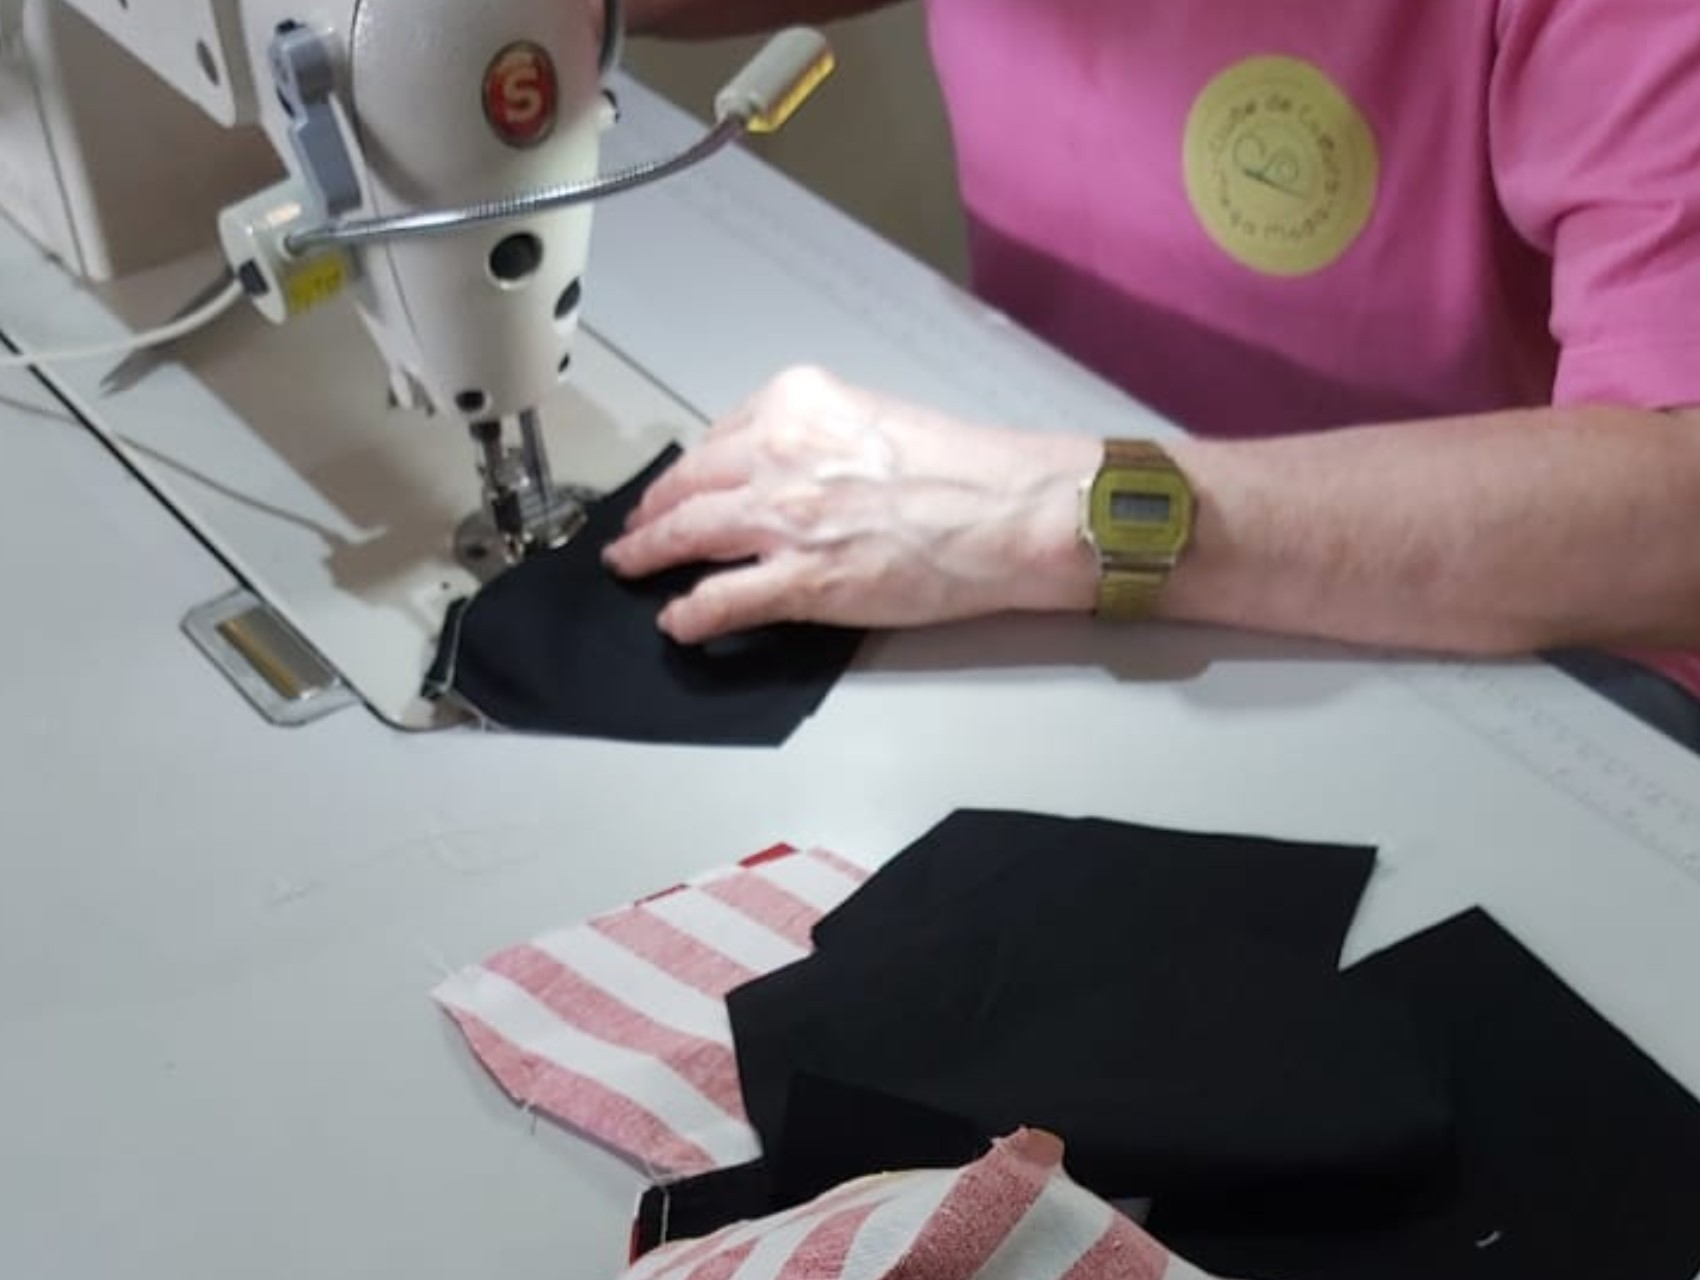 Prefeitura do Crato abre cadastro para costureiros confeccionarem 70 mil máscaras